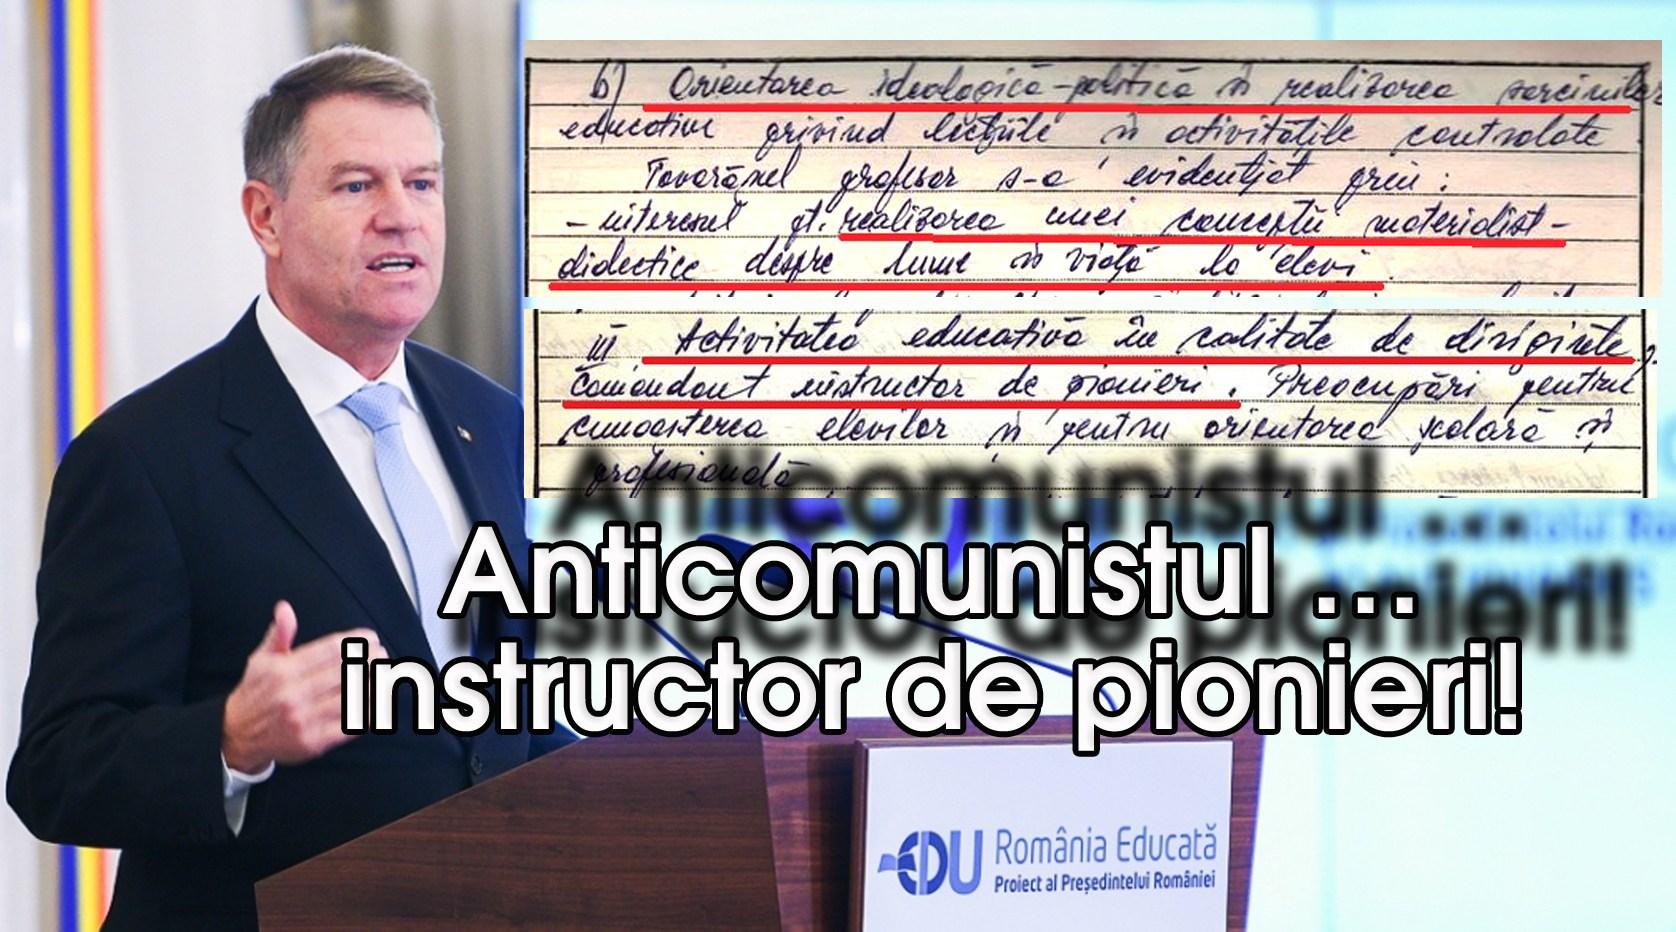 https://i2.wp.com/dantomozei.ro/wp-content/uploads/2019/04/GENERALUL-...-Comandant-instructor-de-pionieri_DanTomozeiRO.jpg